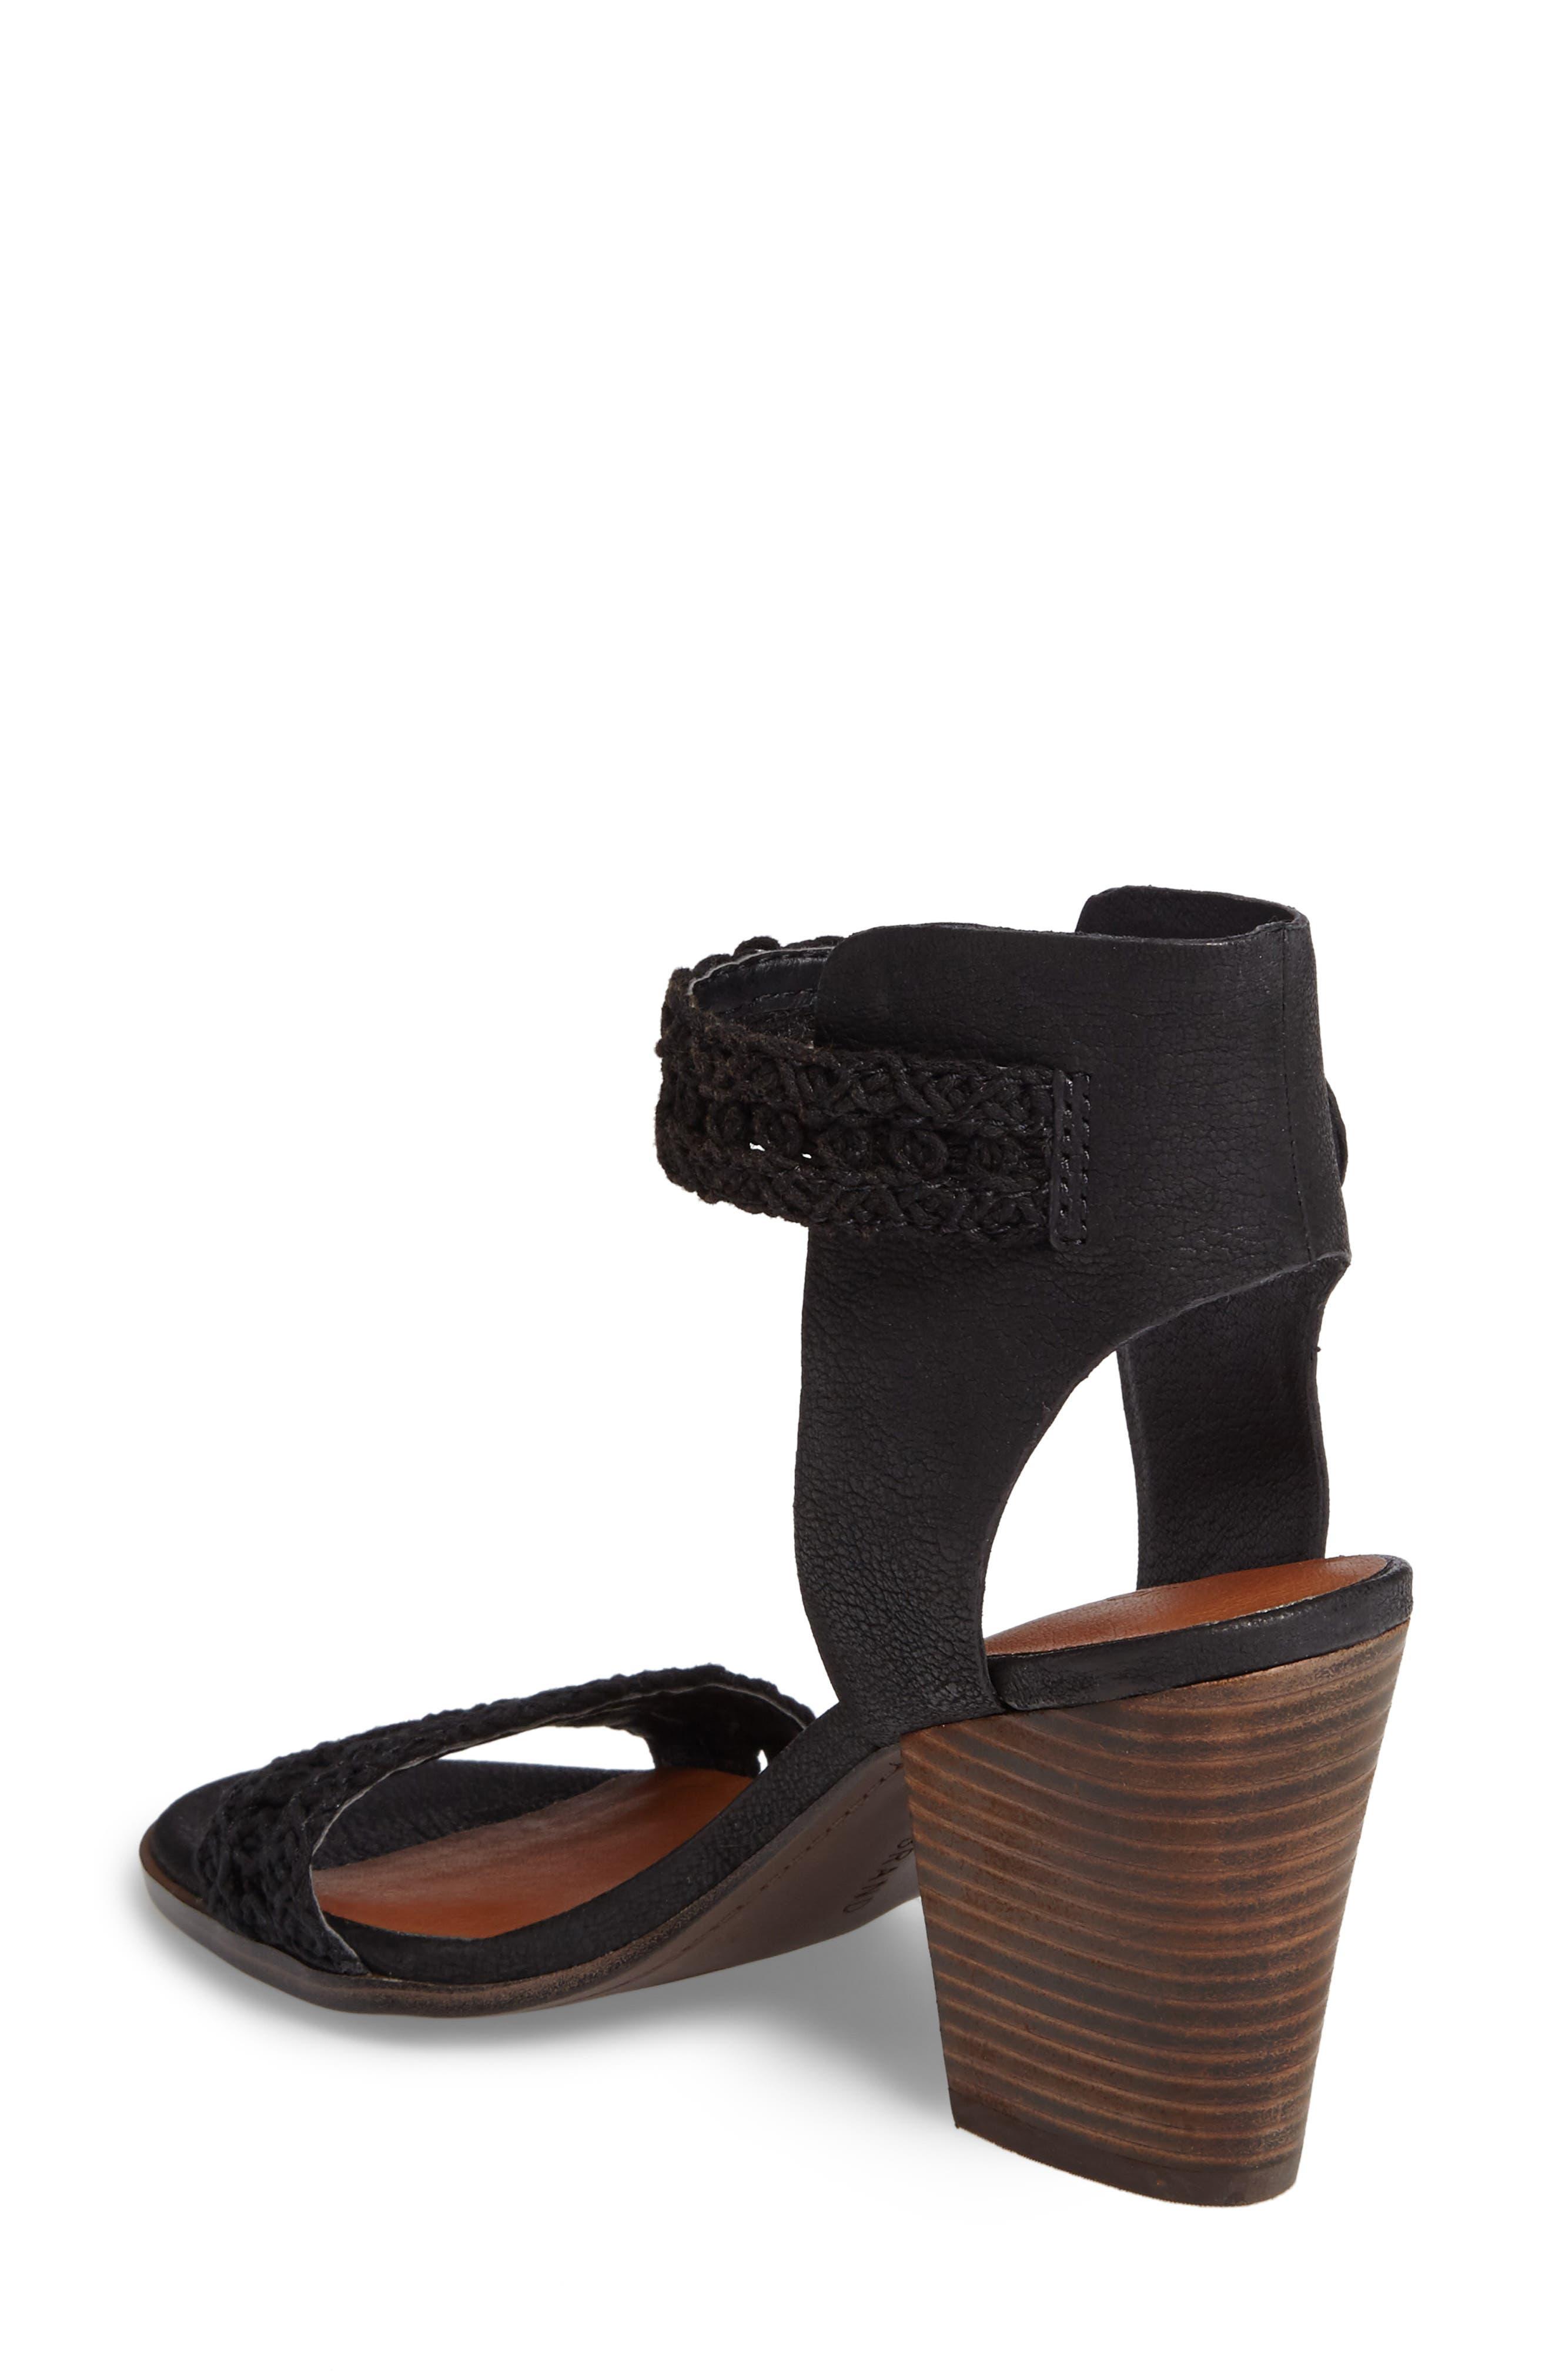 Oakes Ankle Strap Sandal,                             Alternate thumbnail 2, color,                             001